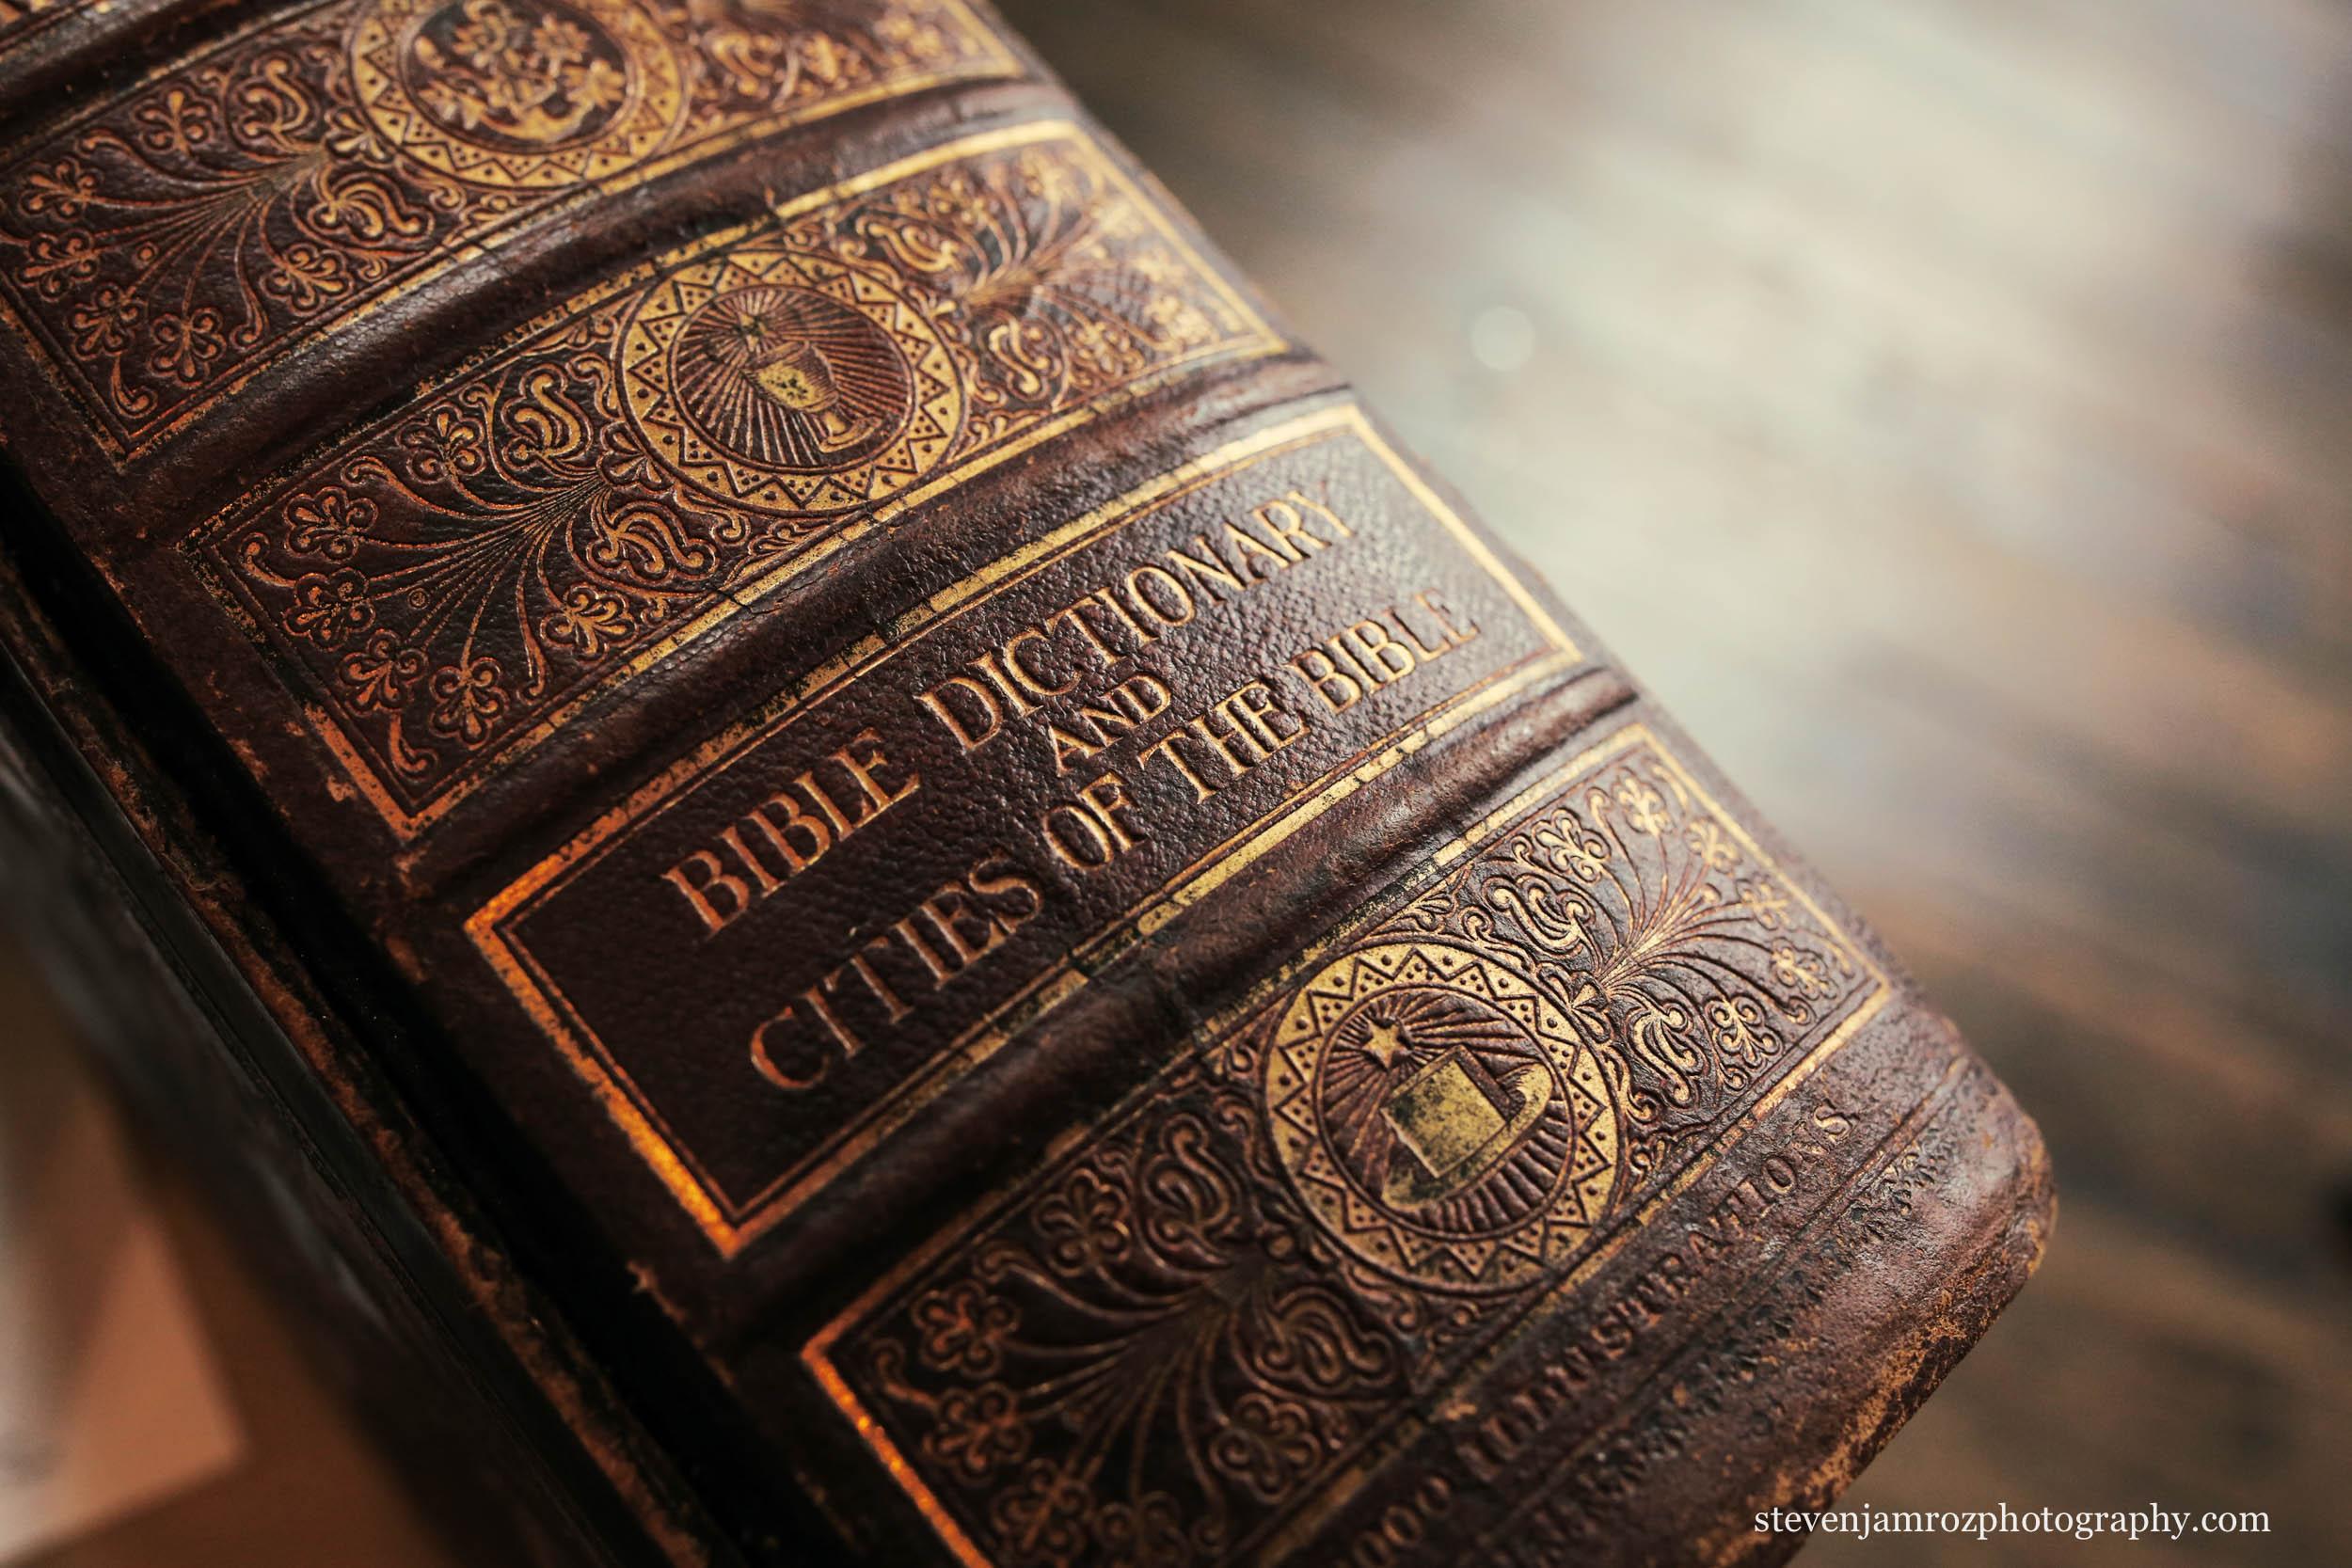 holy-bible-all-saints-church-raleigh-steven-jamroz-photography-0115.jpg